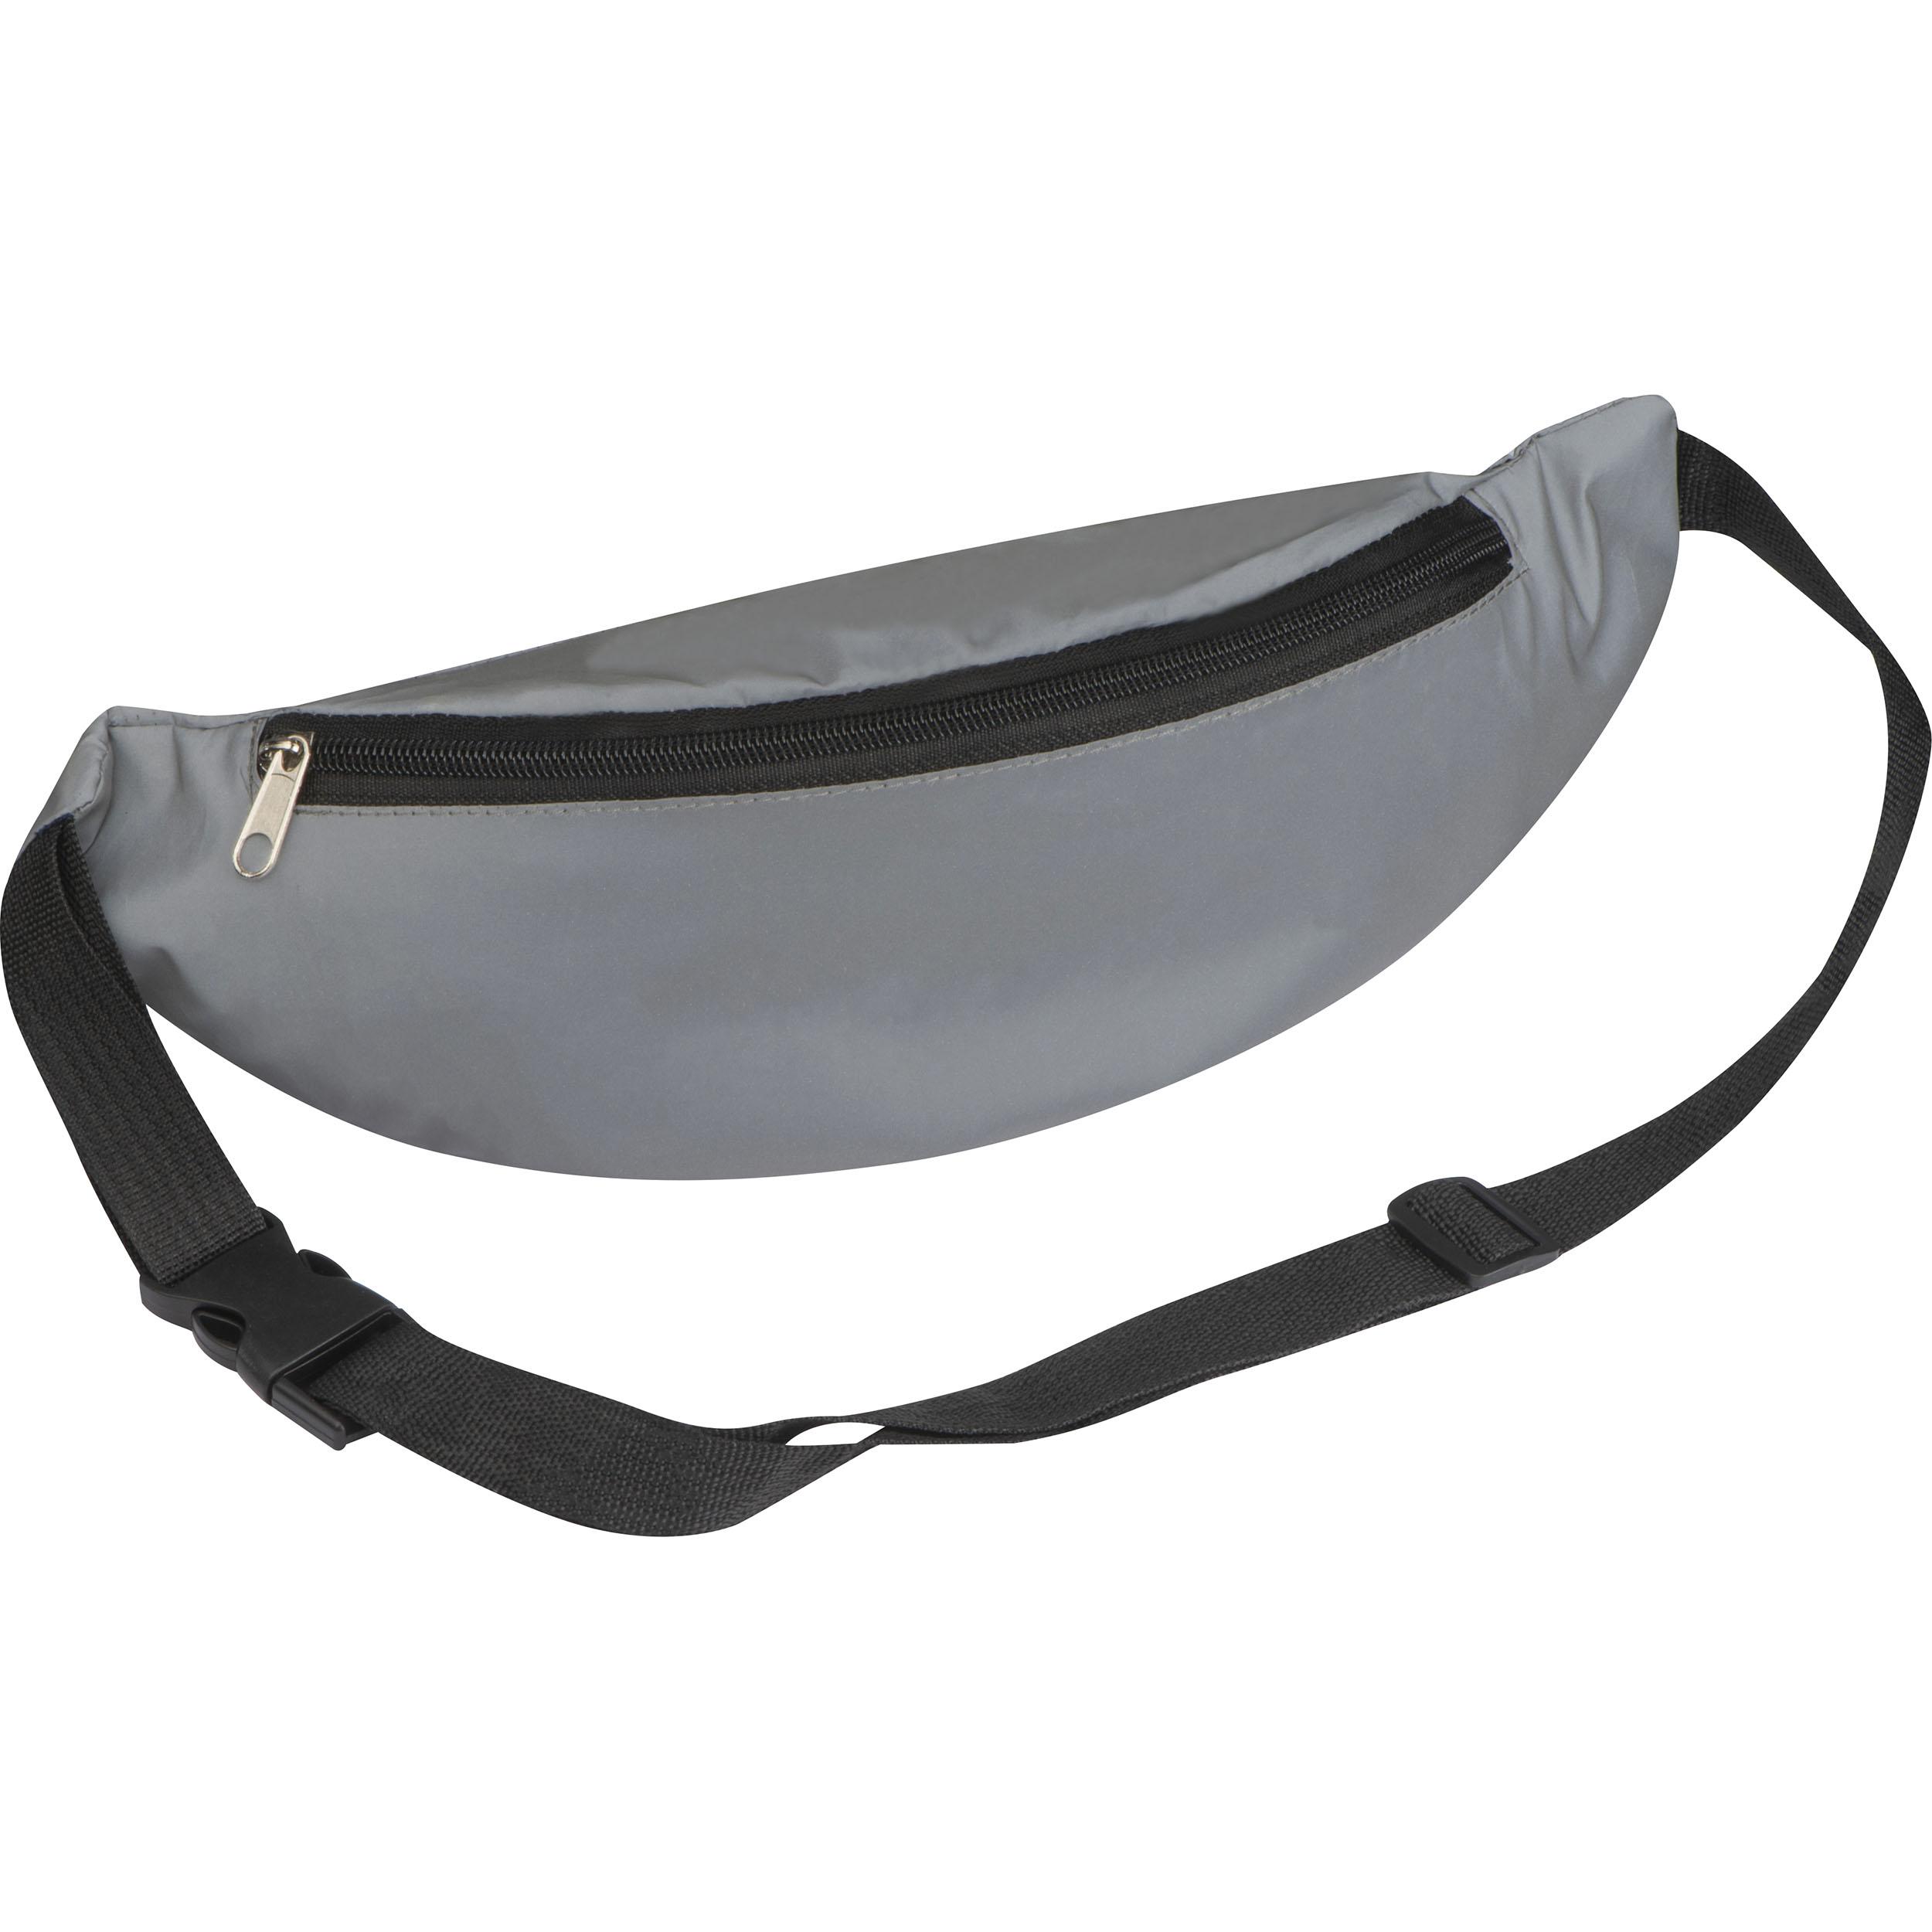 Reflecting Waist Bag